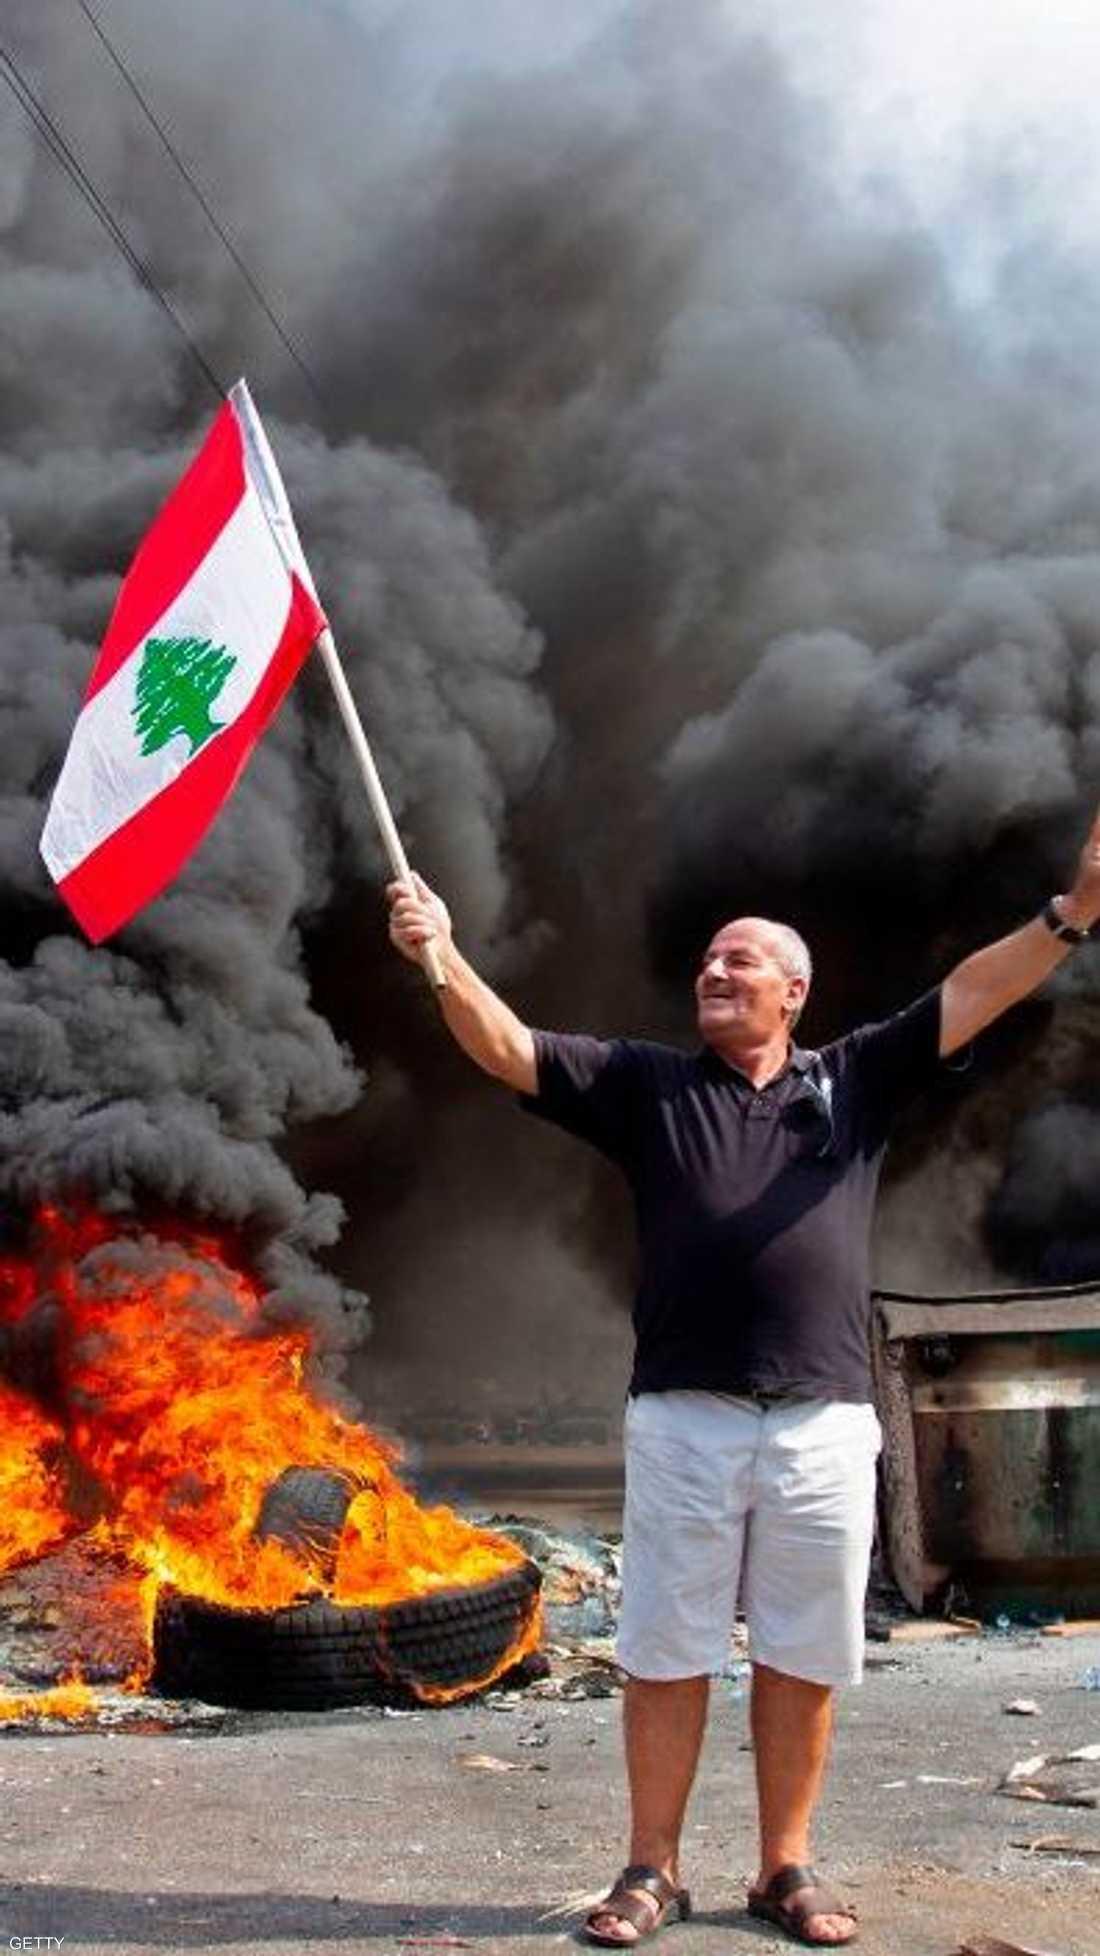 احتجاجات ضخمة قي لبنان